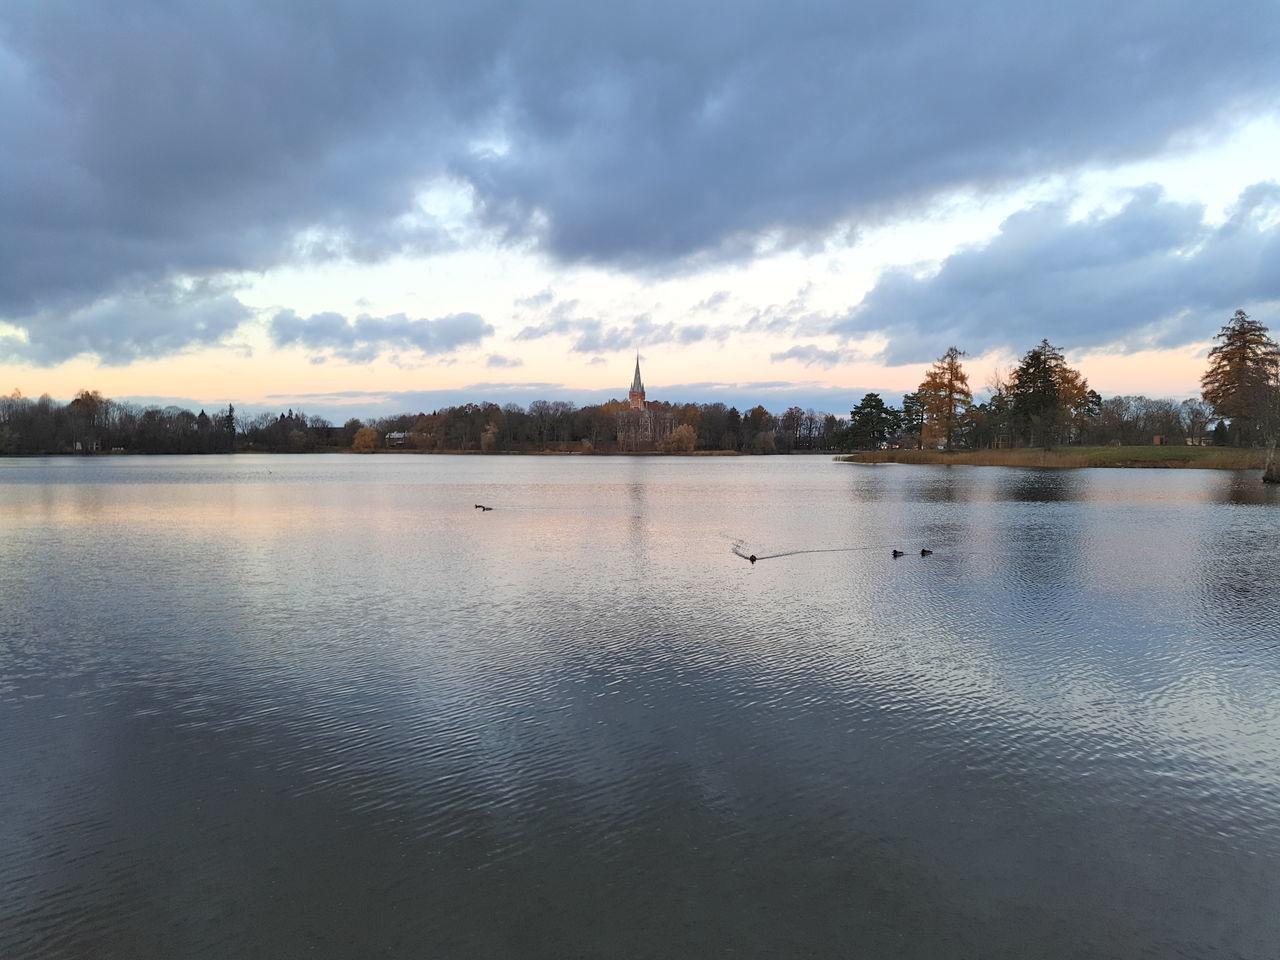 Castle Lentvaris Pilis Sky Water Outdoors Beauty In Nature Lentvaris Pilis Lithuania Castle First Eyeem Photo